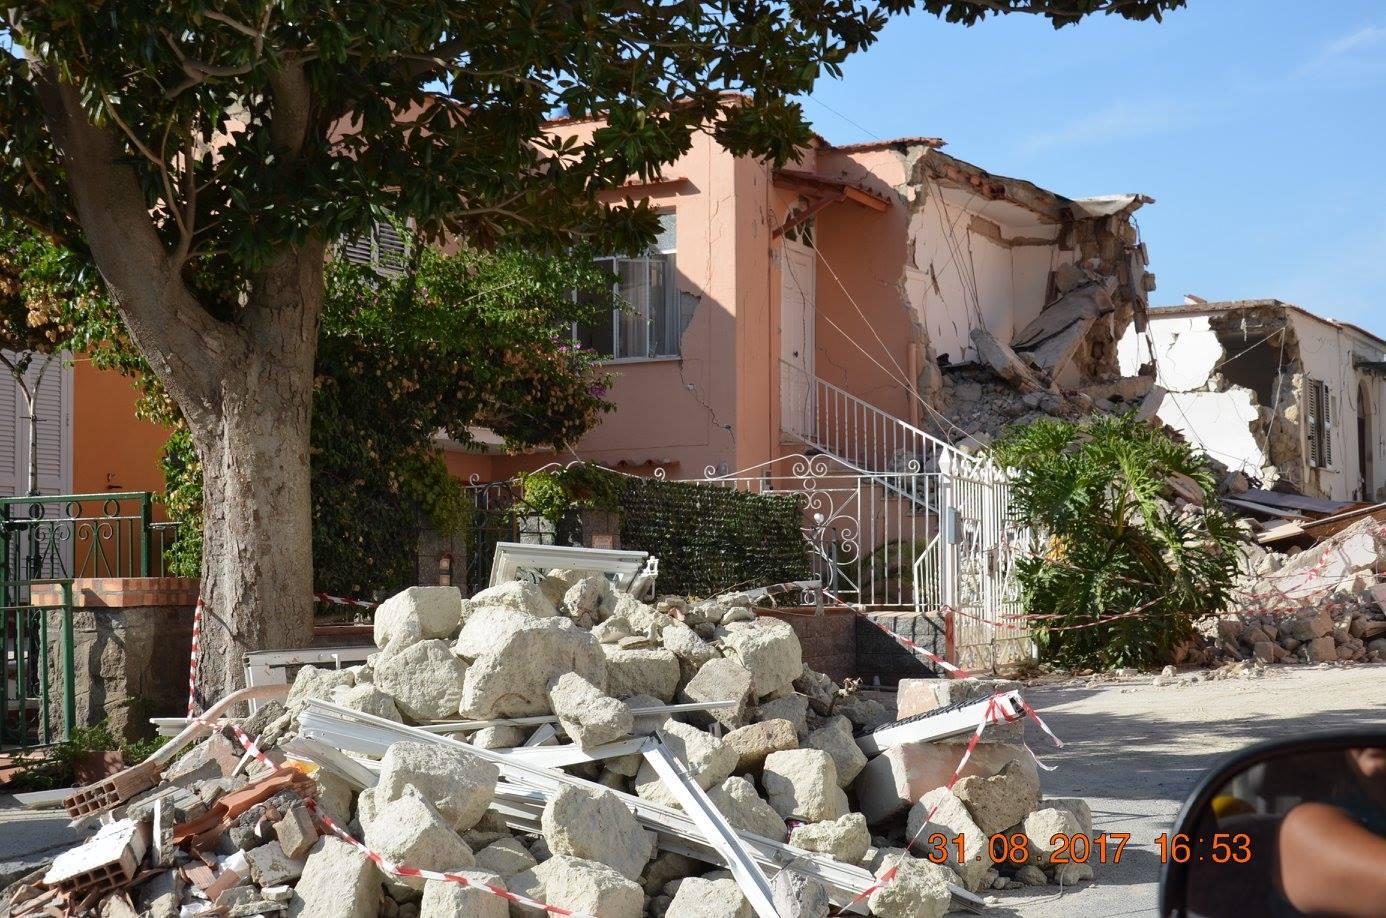 Napoli, premiati 129 ingegneri volontari impegnati nelle fasi post terremoto